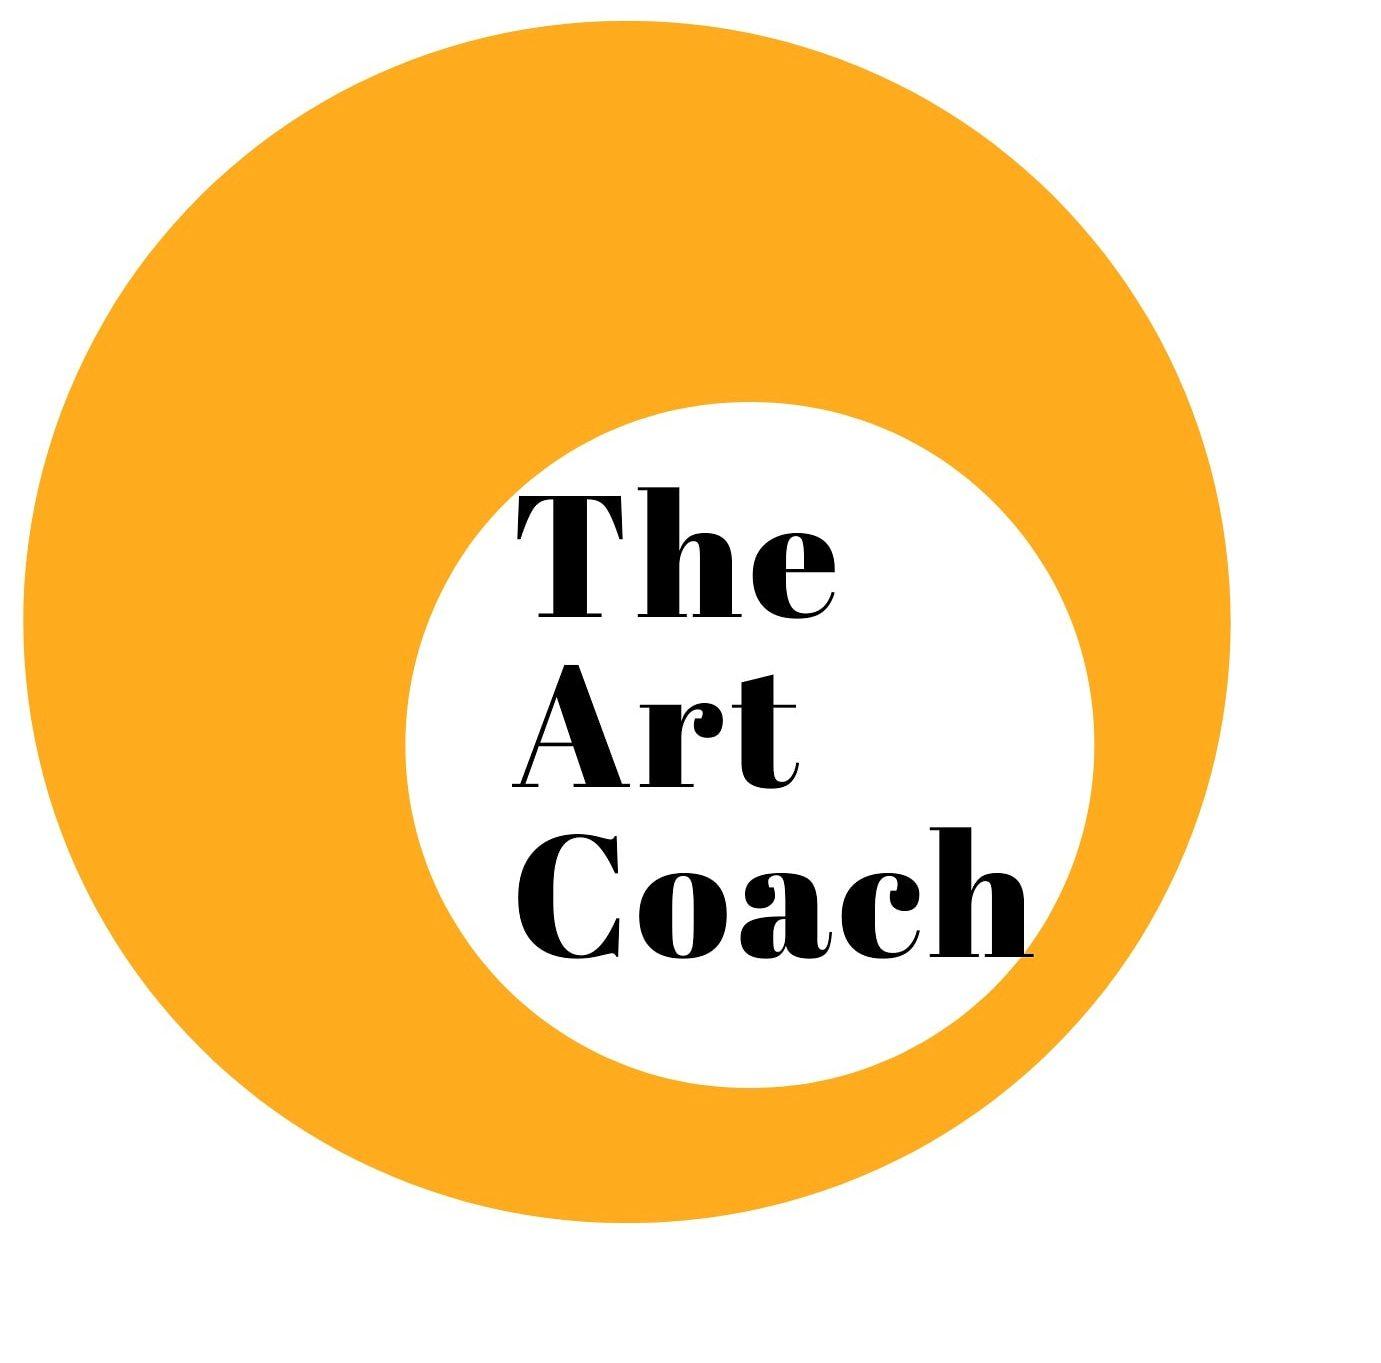 The Art Coach